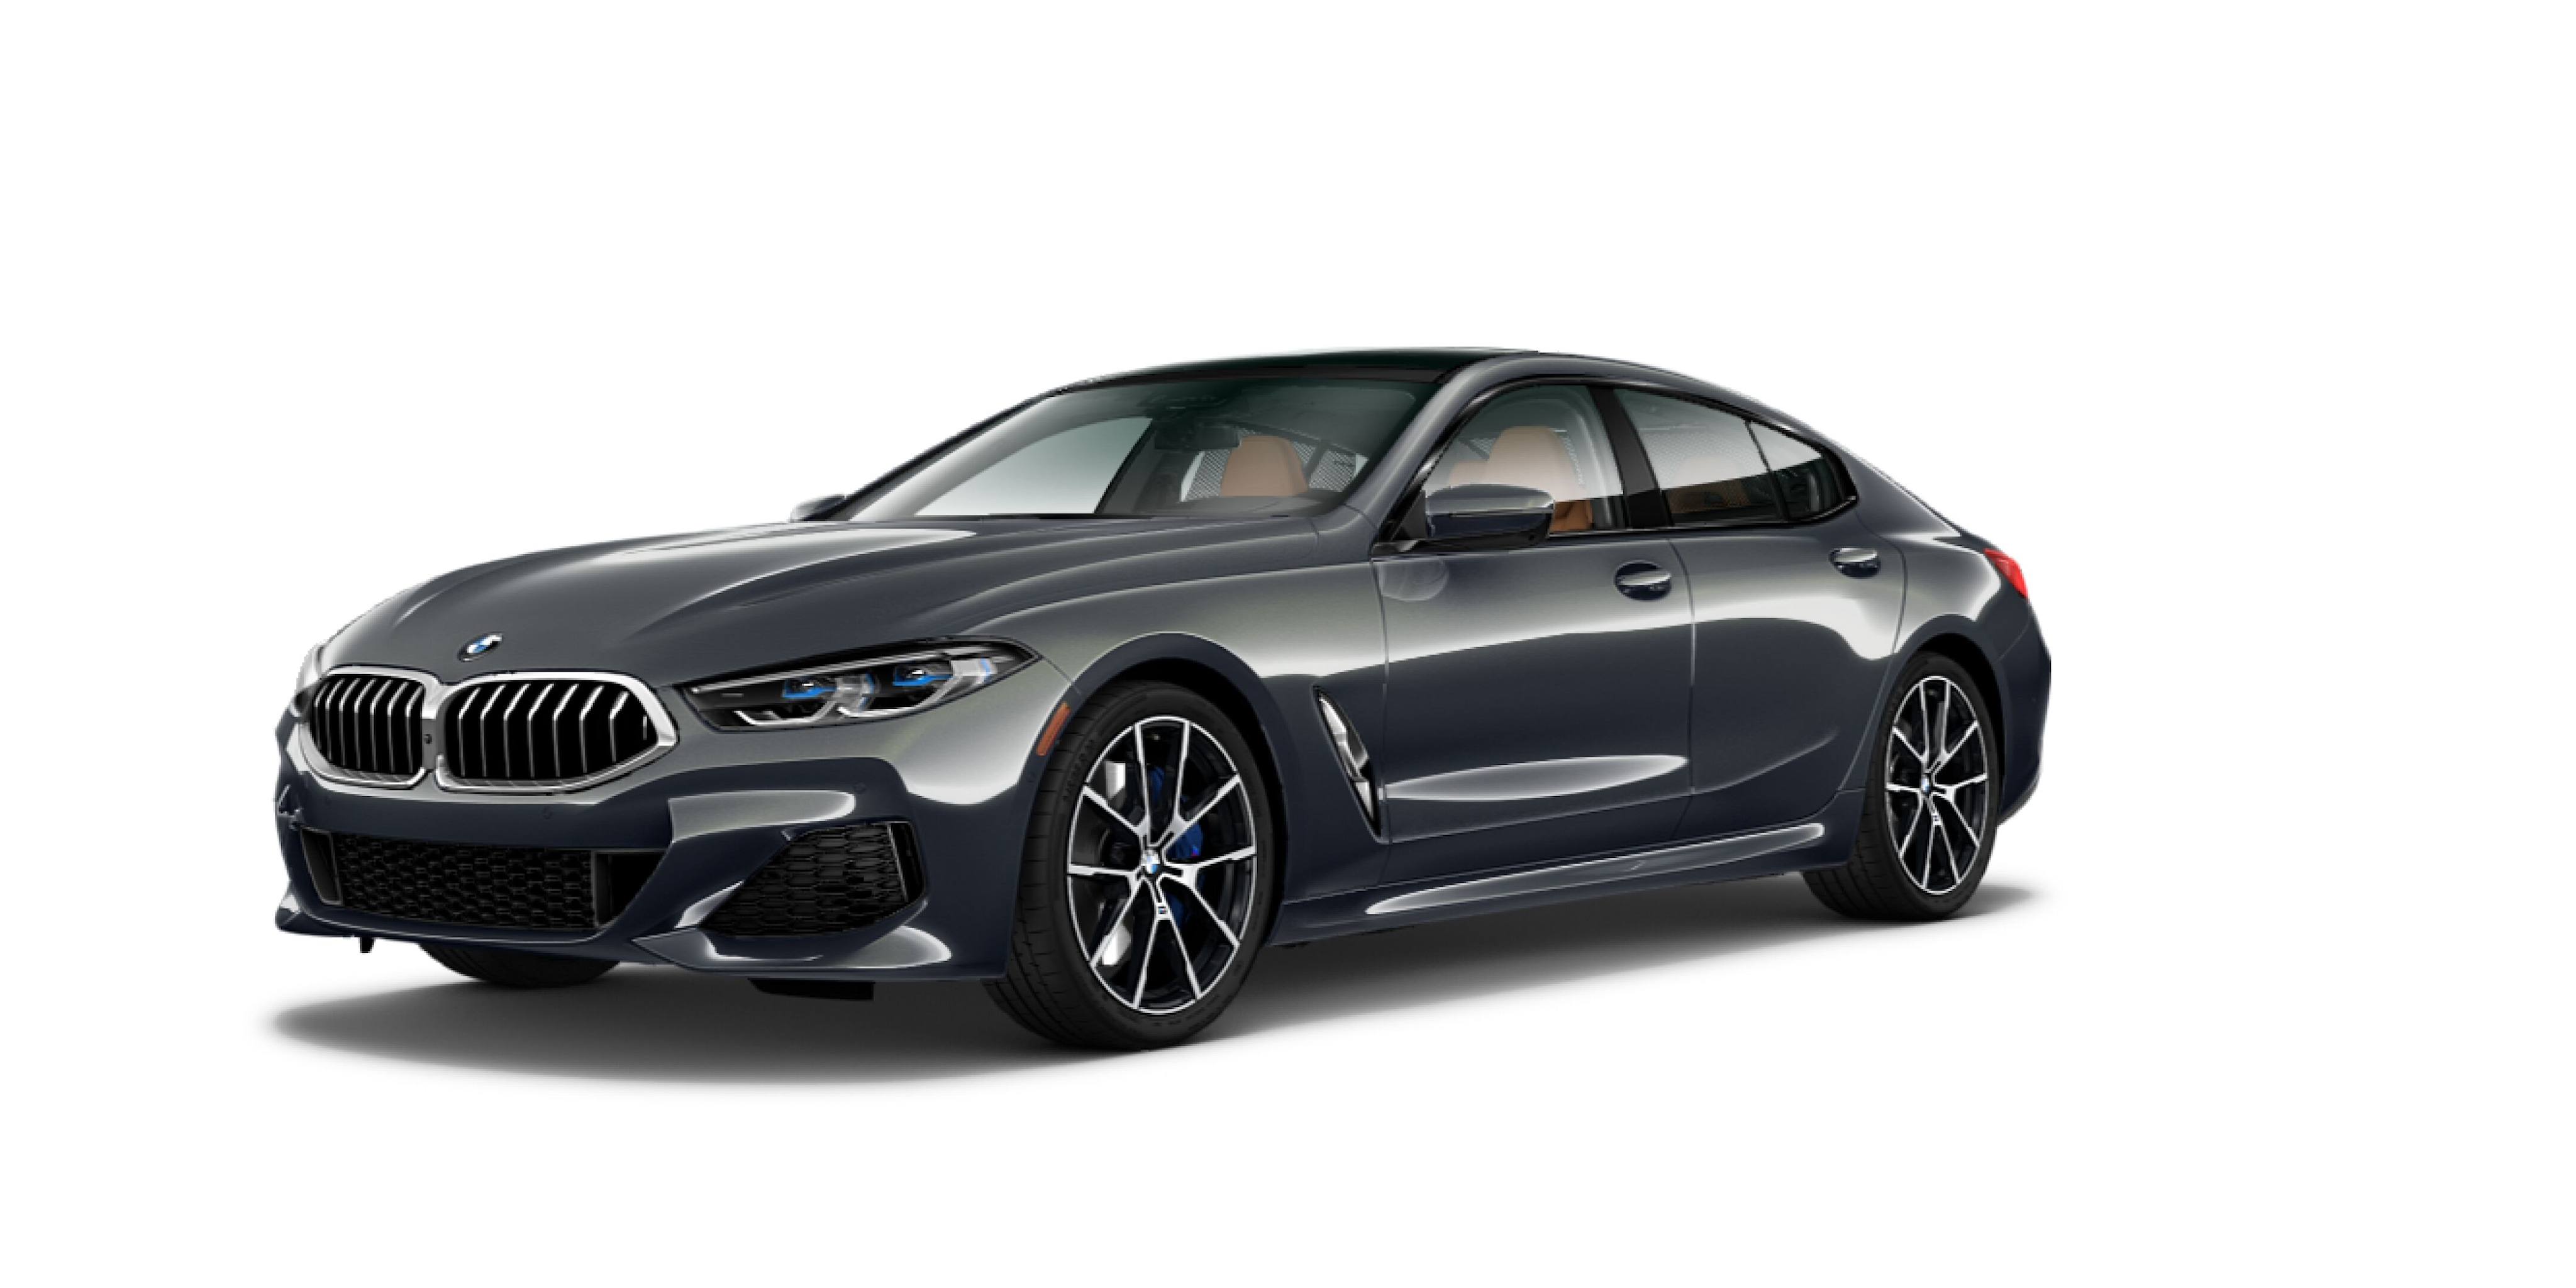 2020 BMW 8 Series 840i Sedan